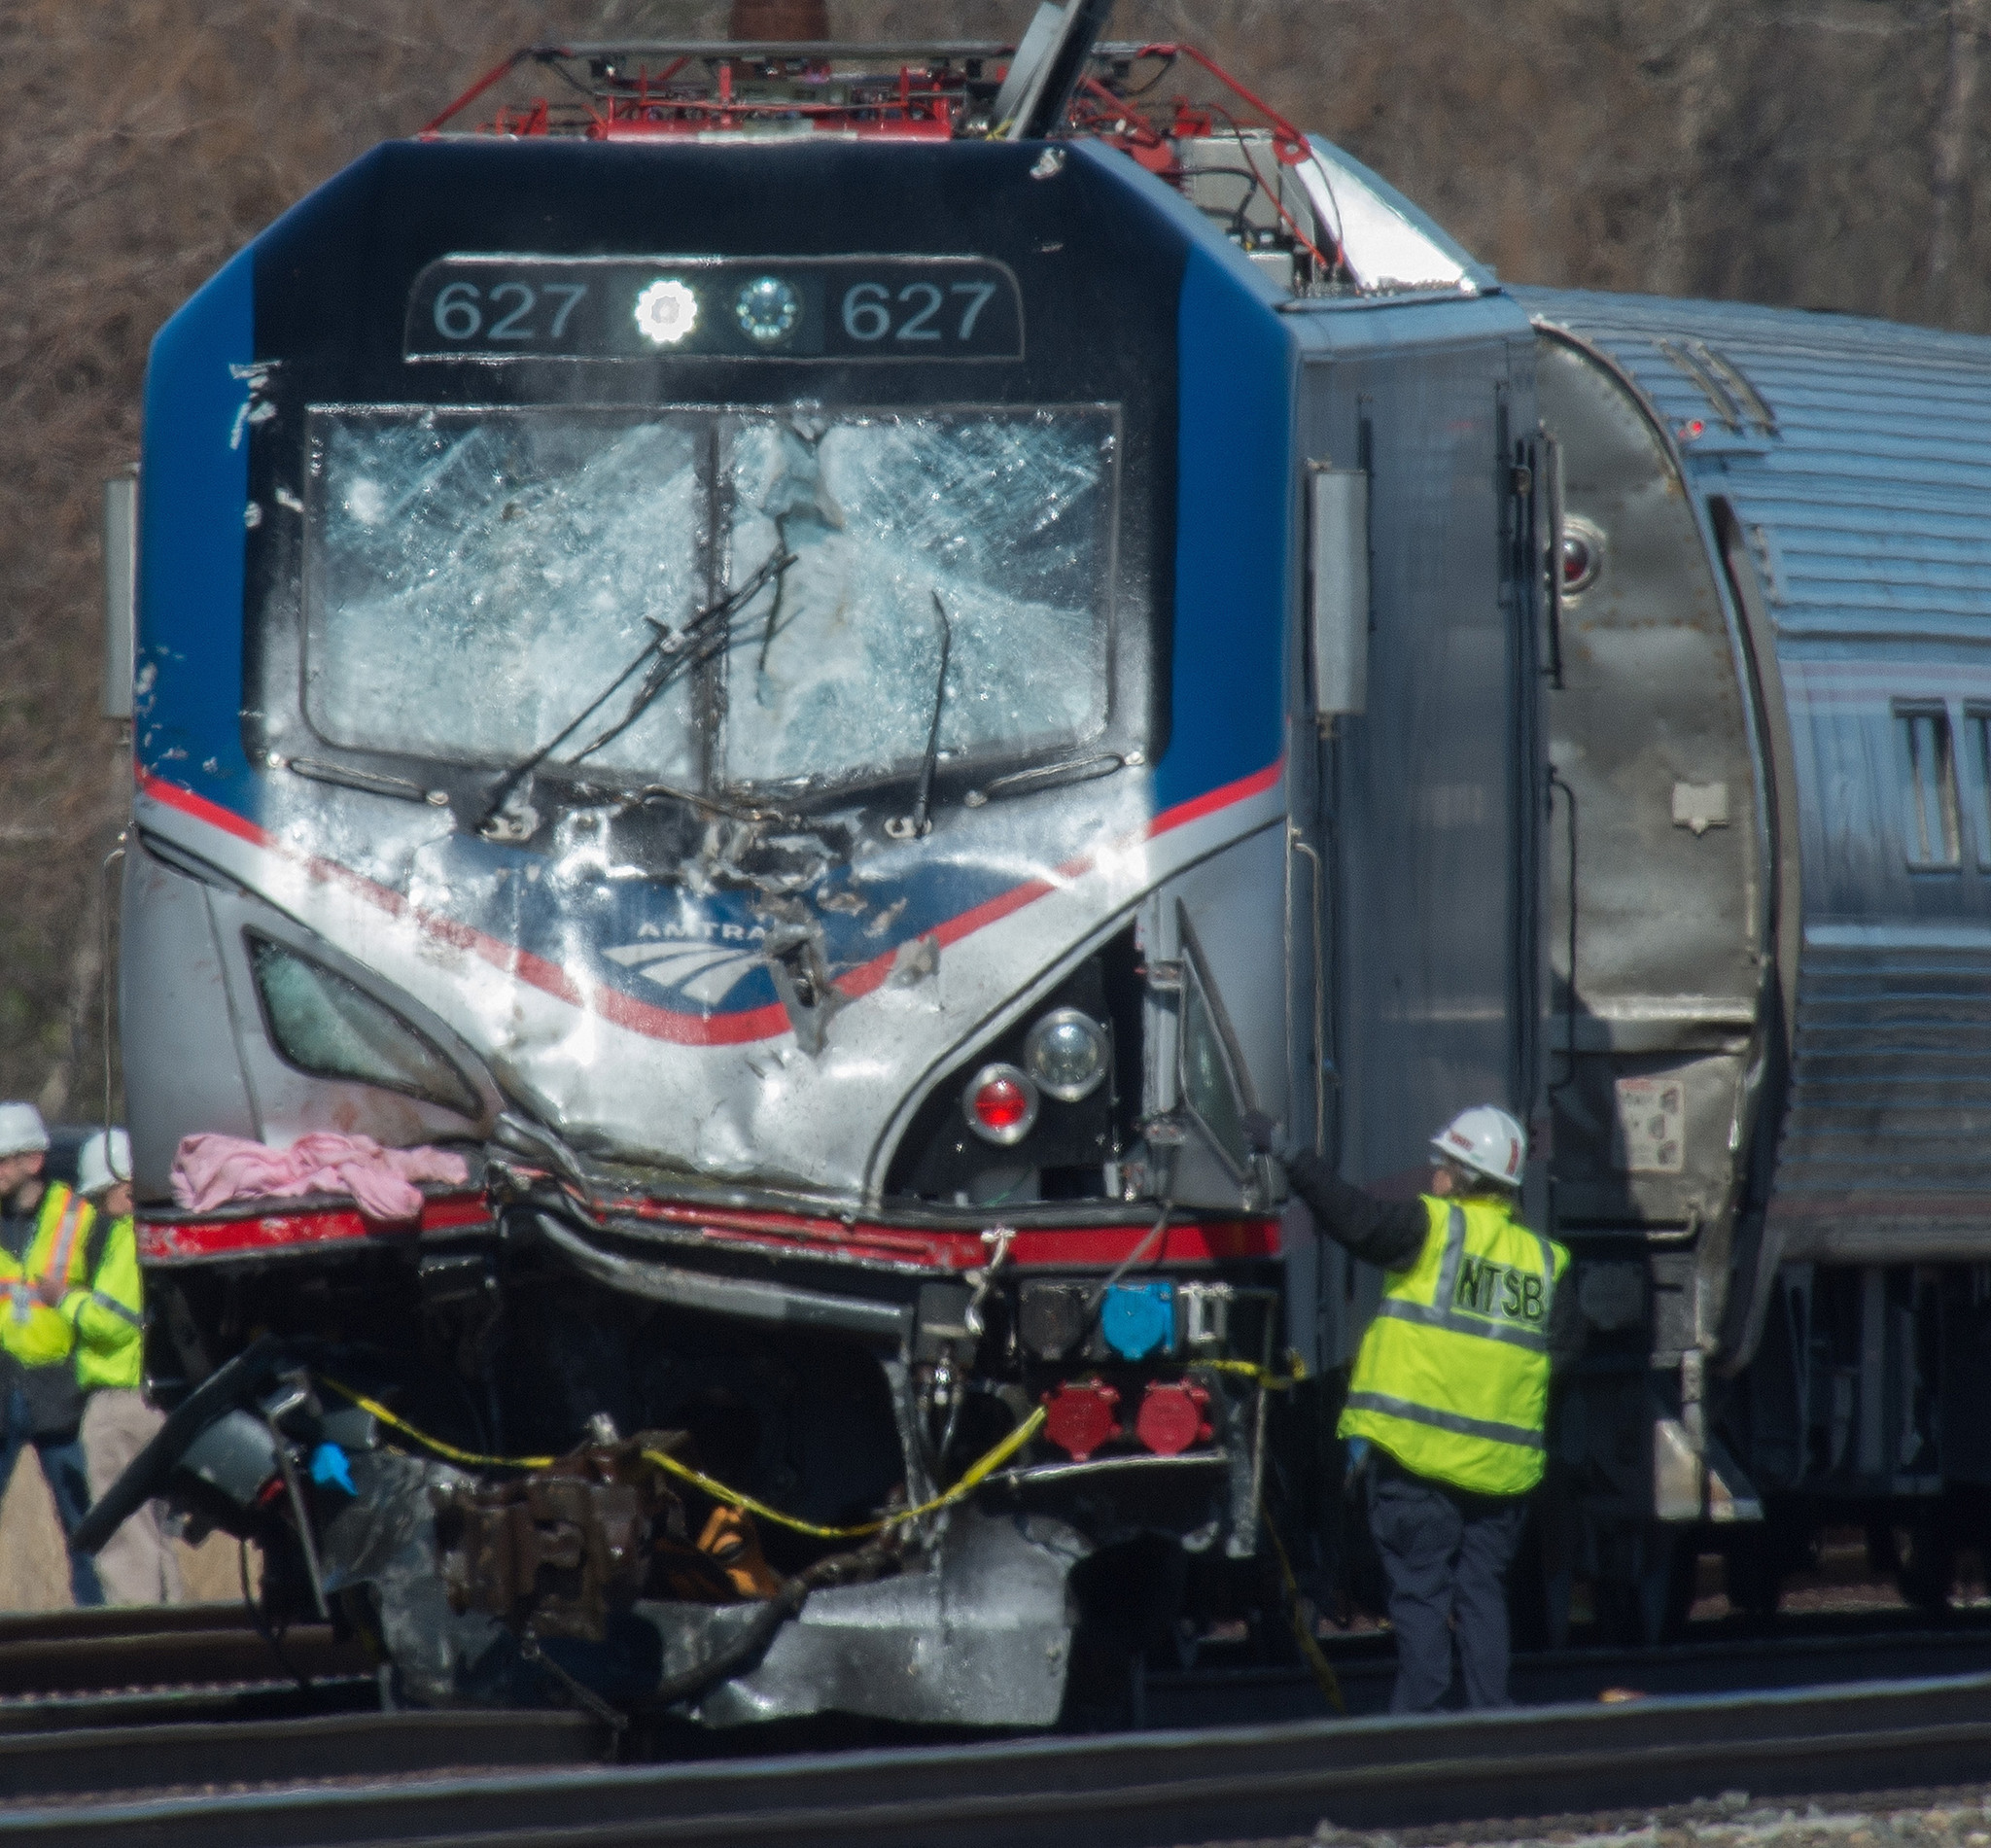 2 dead, dozens hurt in Amtrak train derailment near Philadelphia